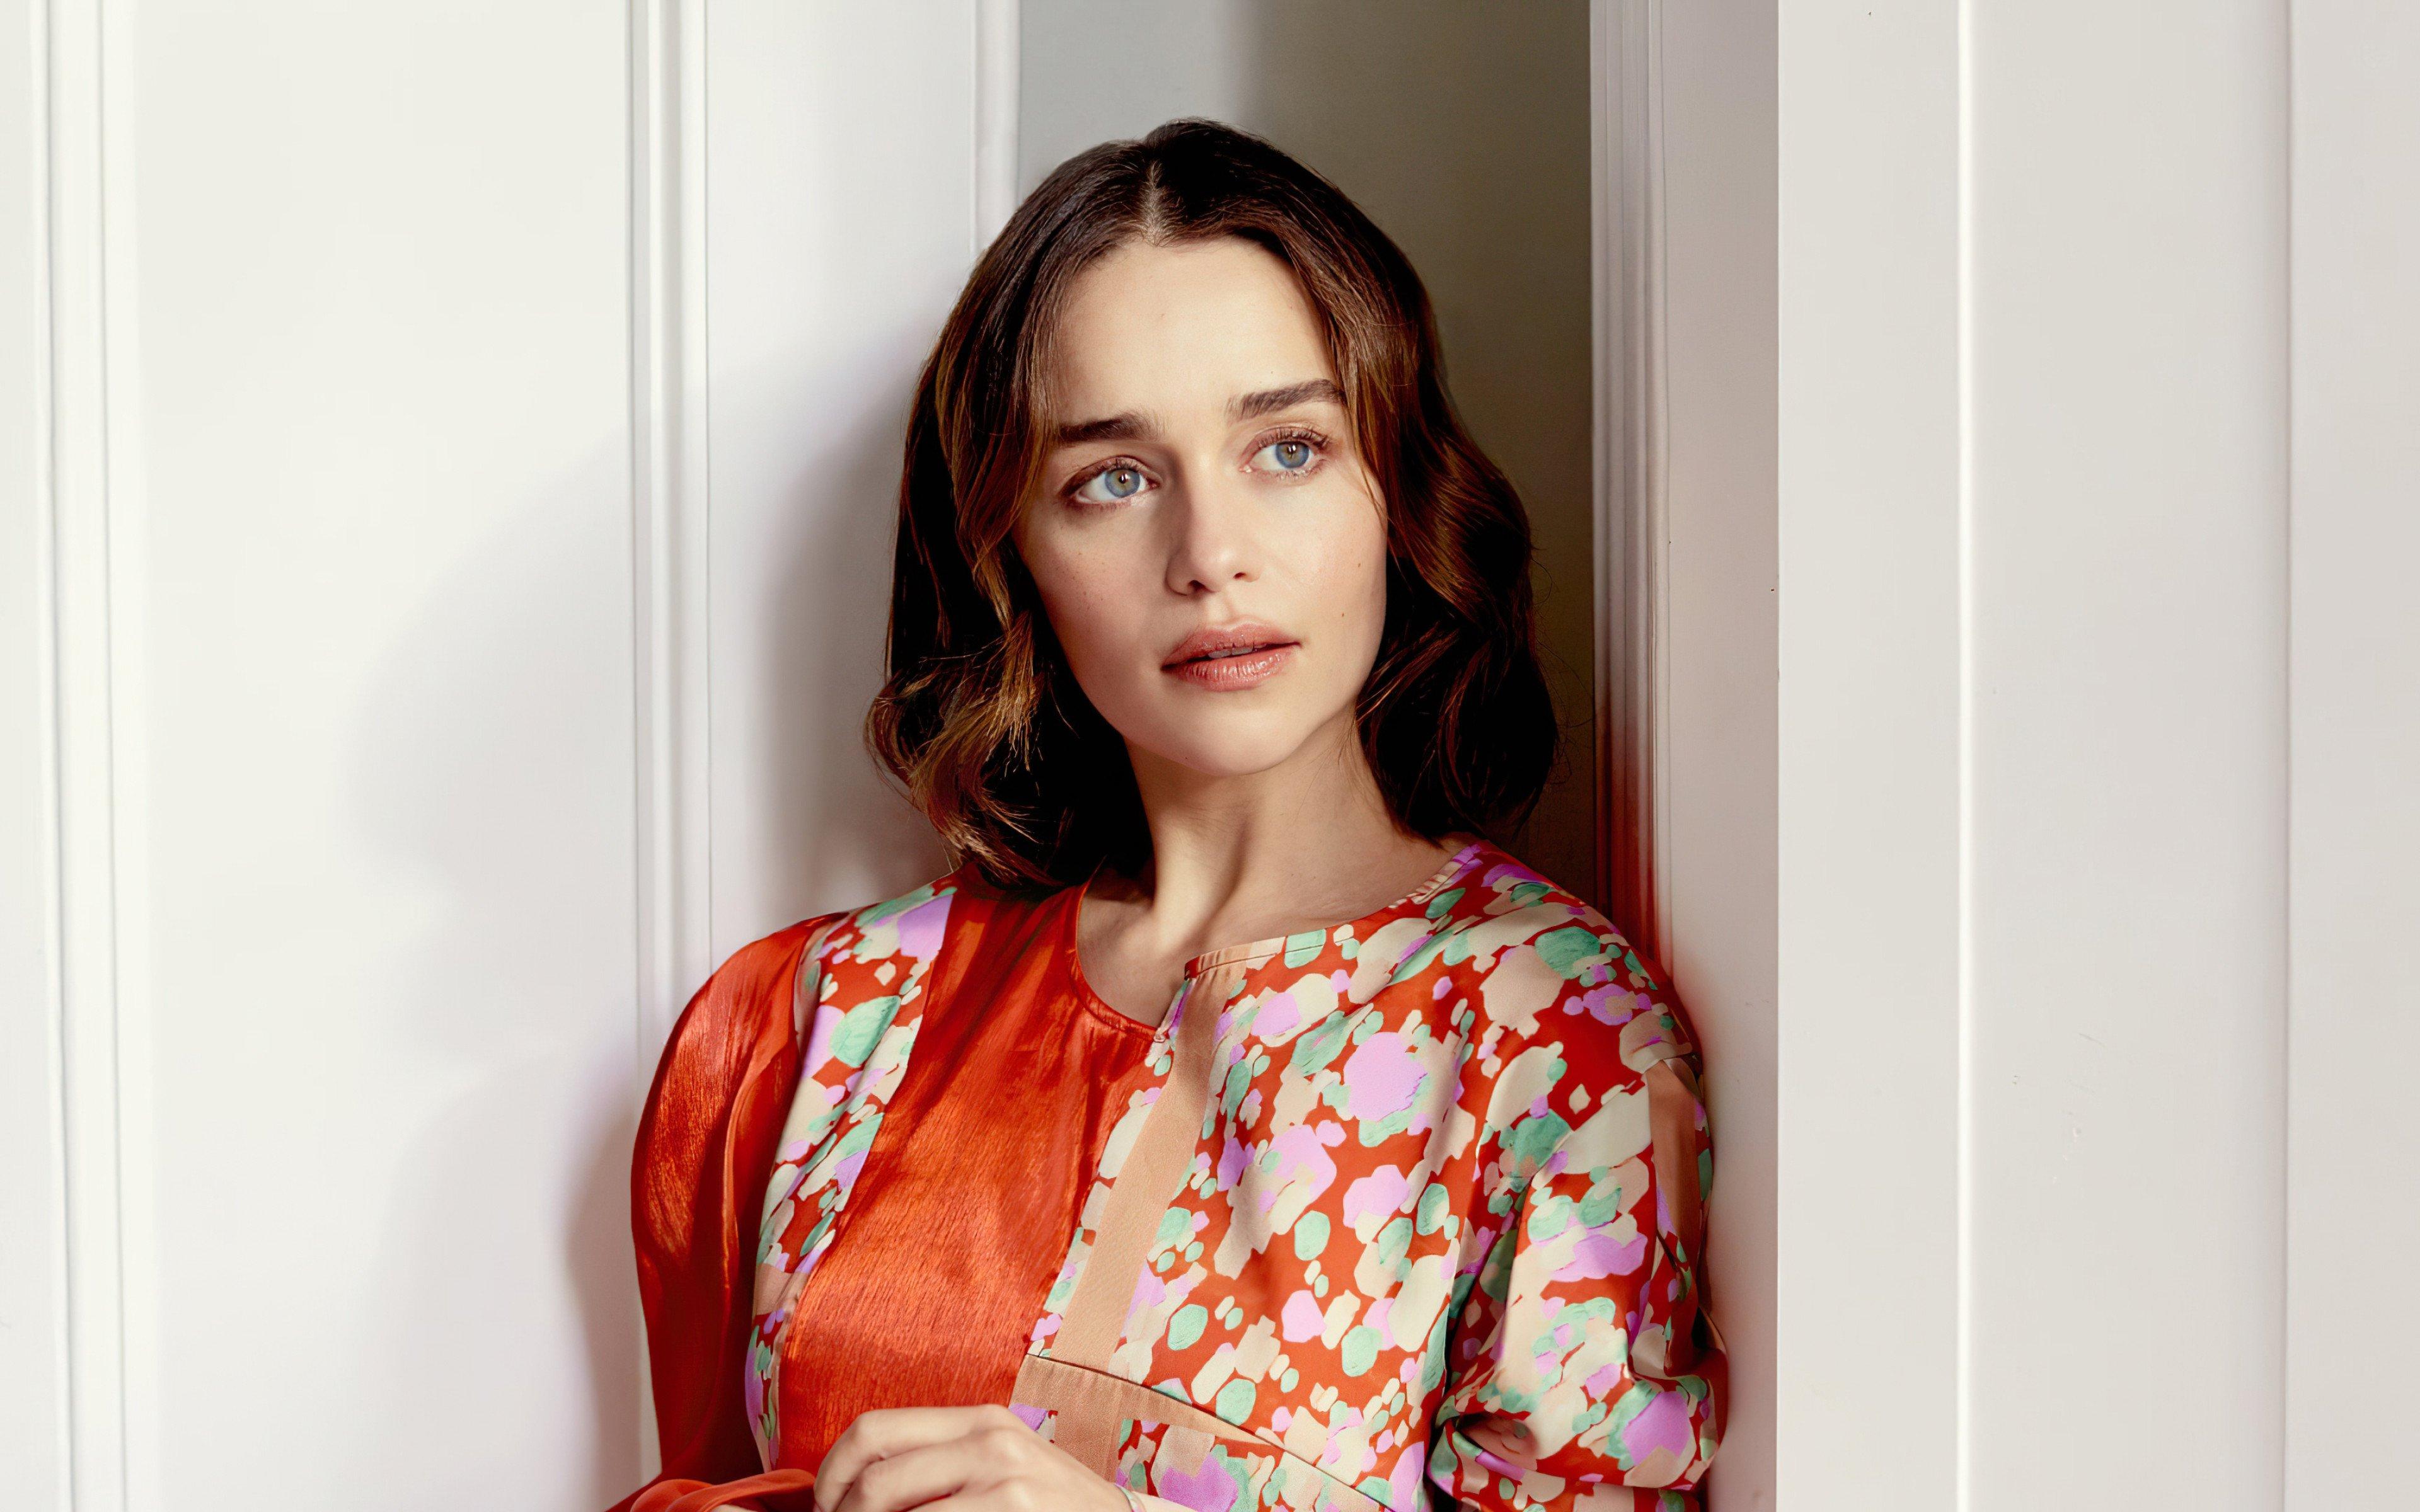 Fondos de pantalla Emilia Clarke para revista The observer